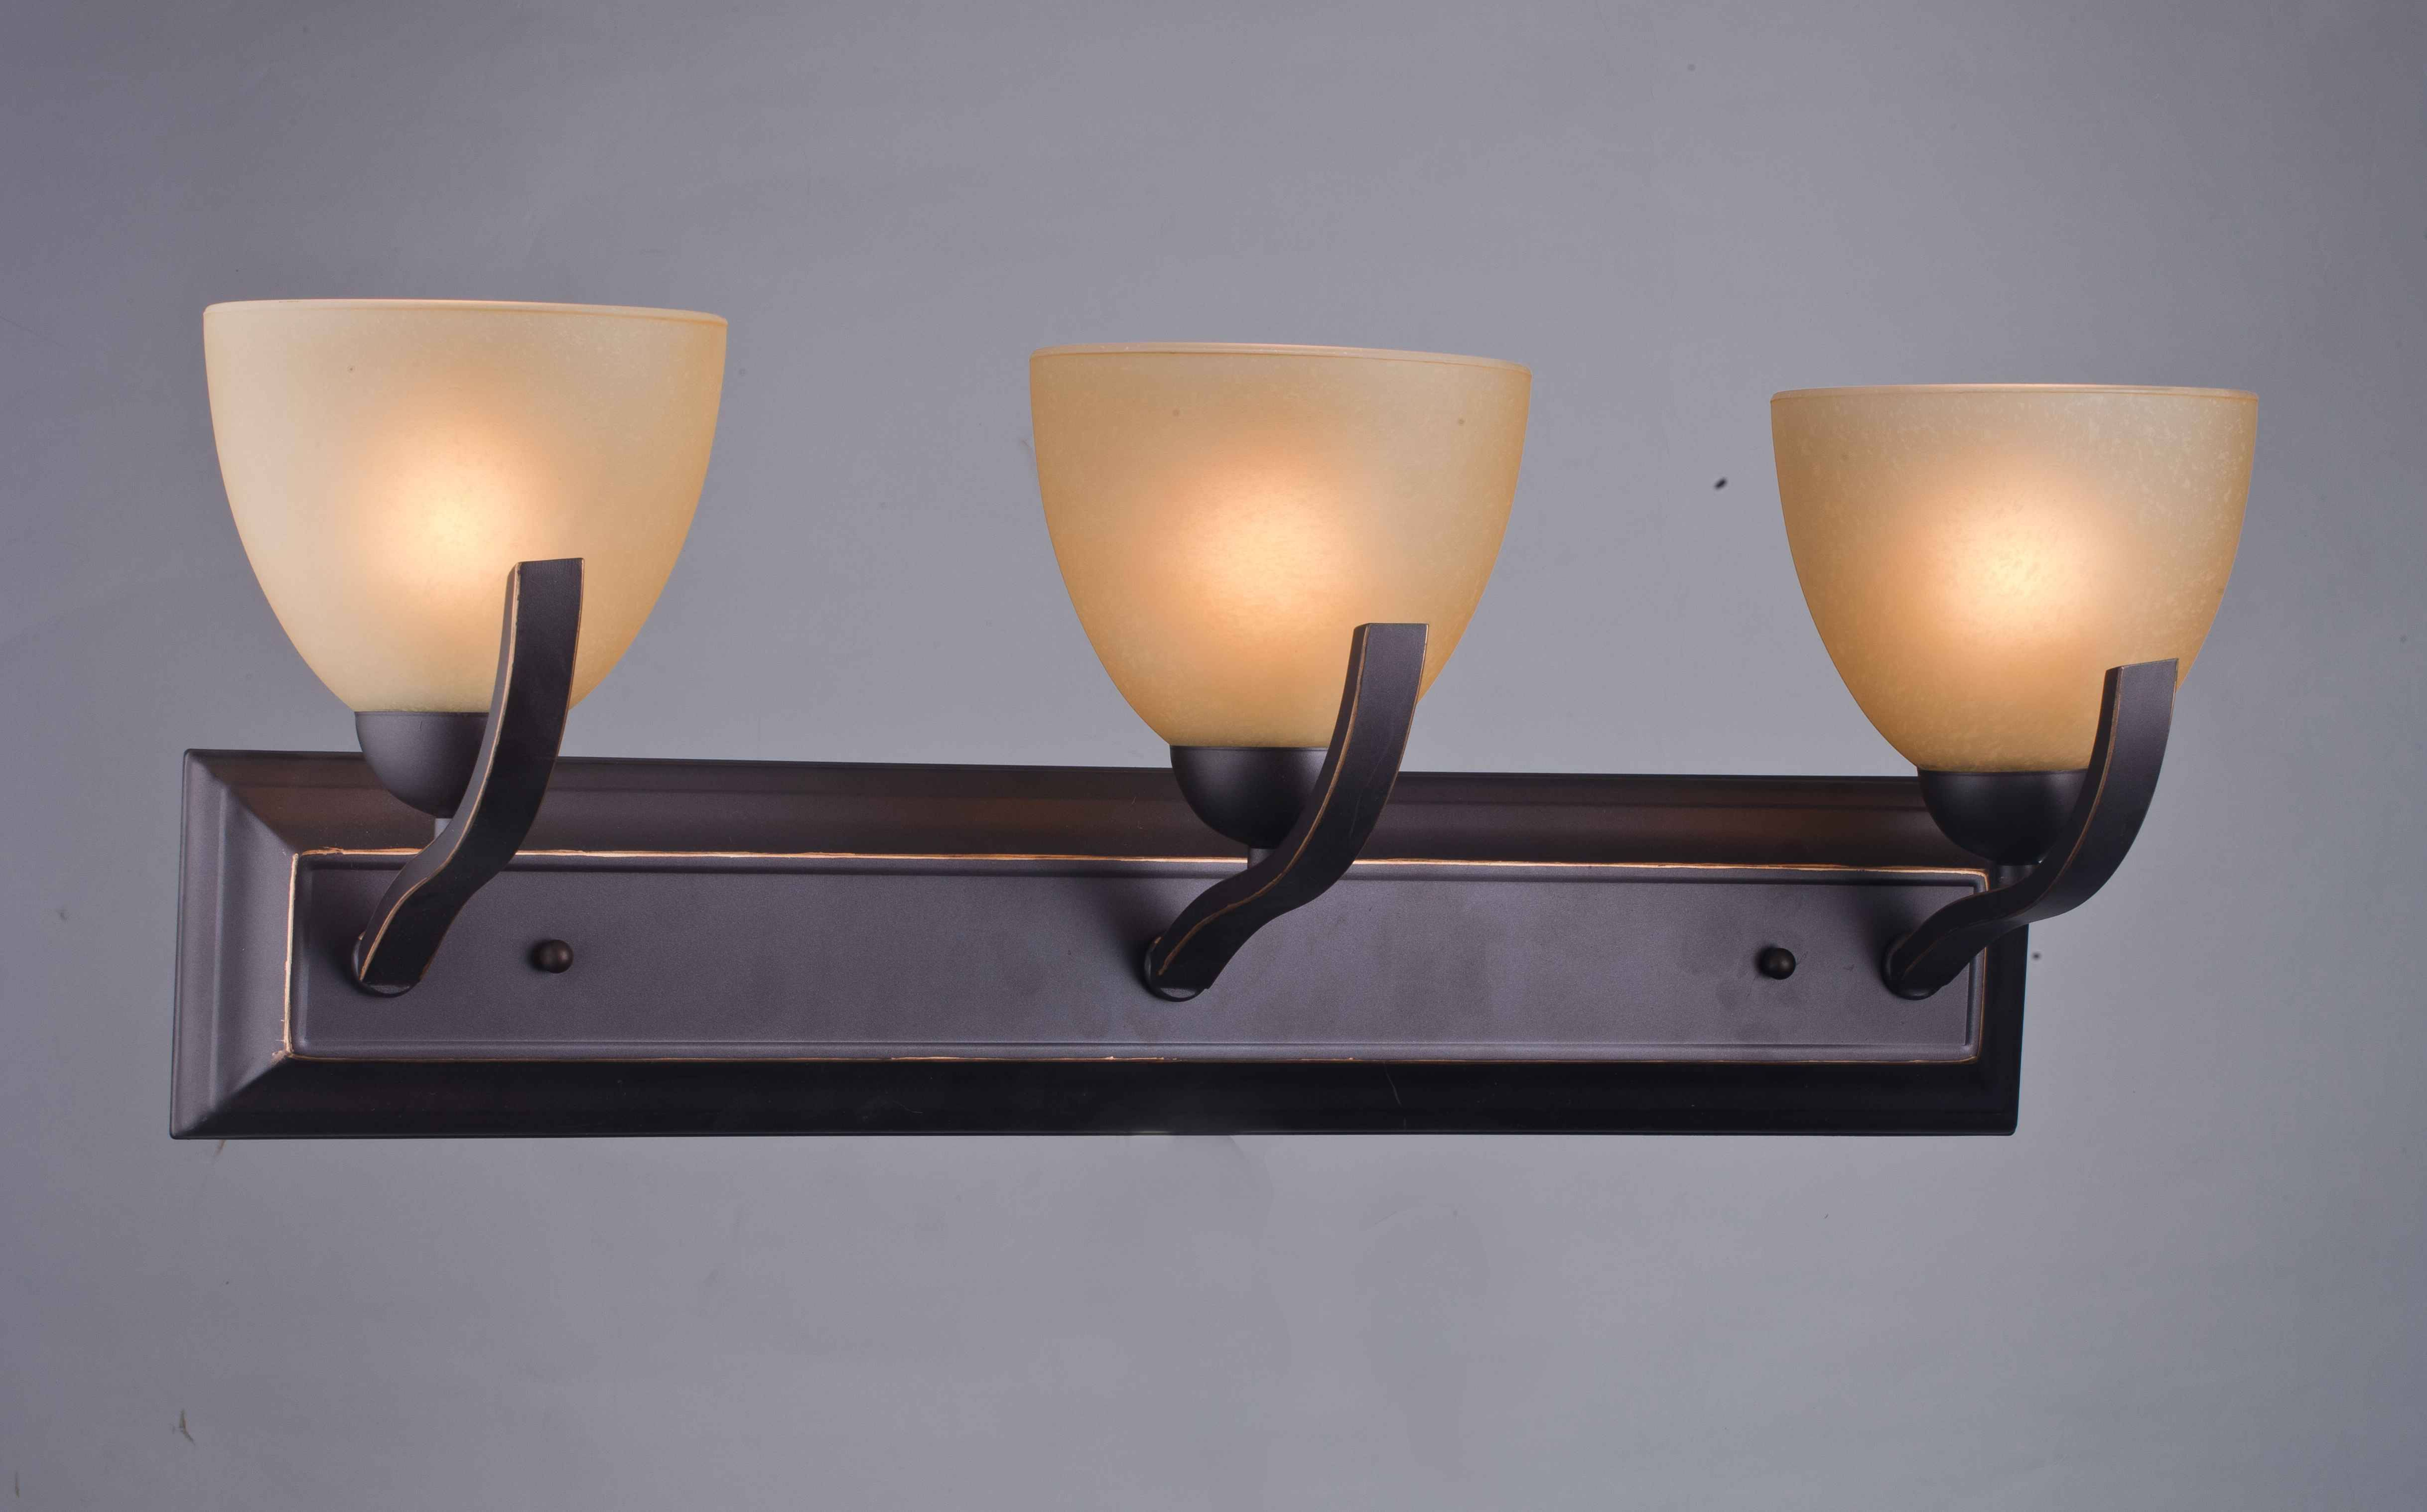 2014 UL CUL CE listed  Vanity Lighting fixtures